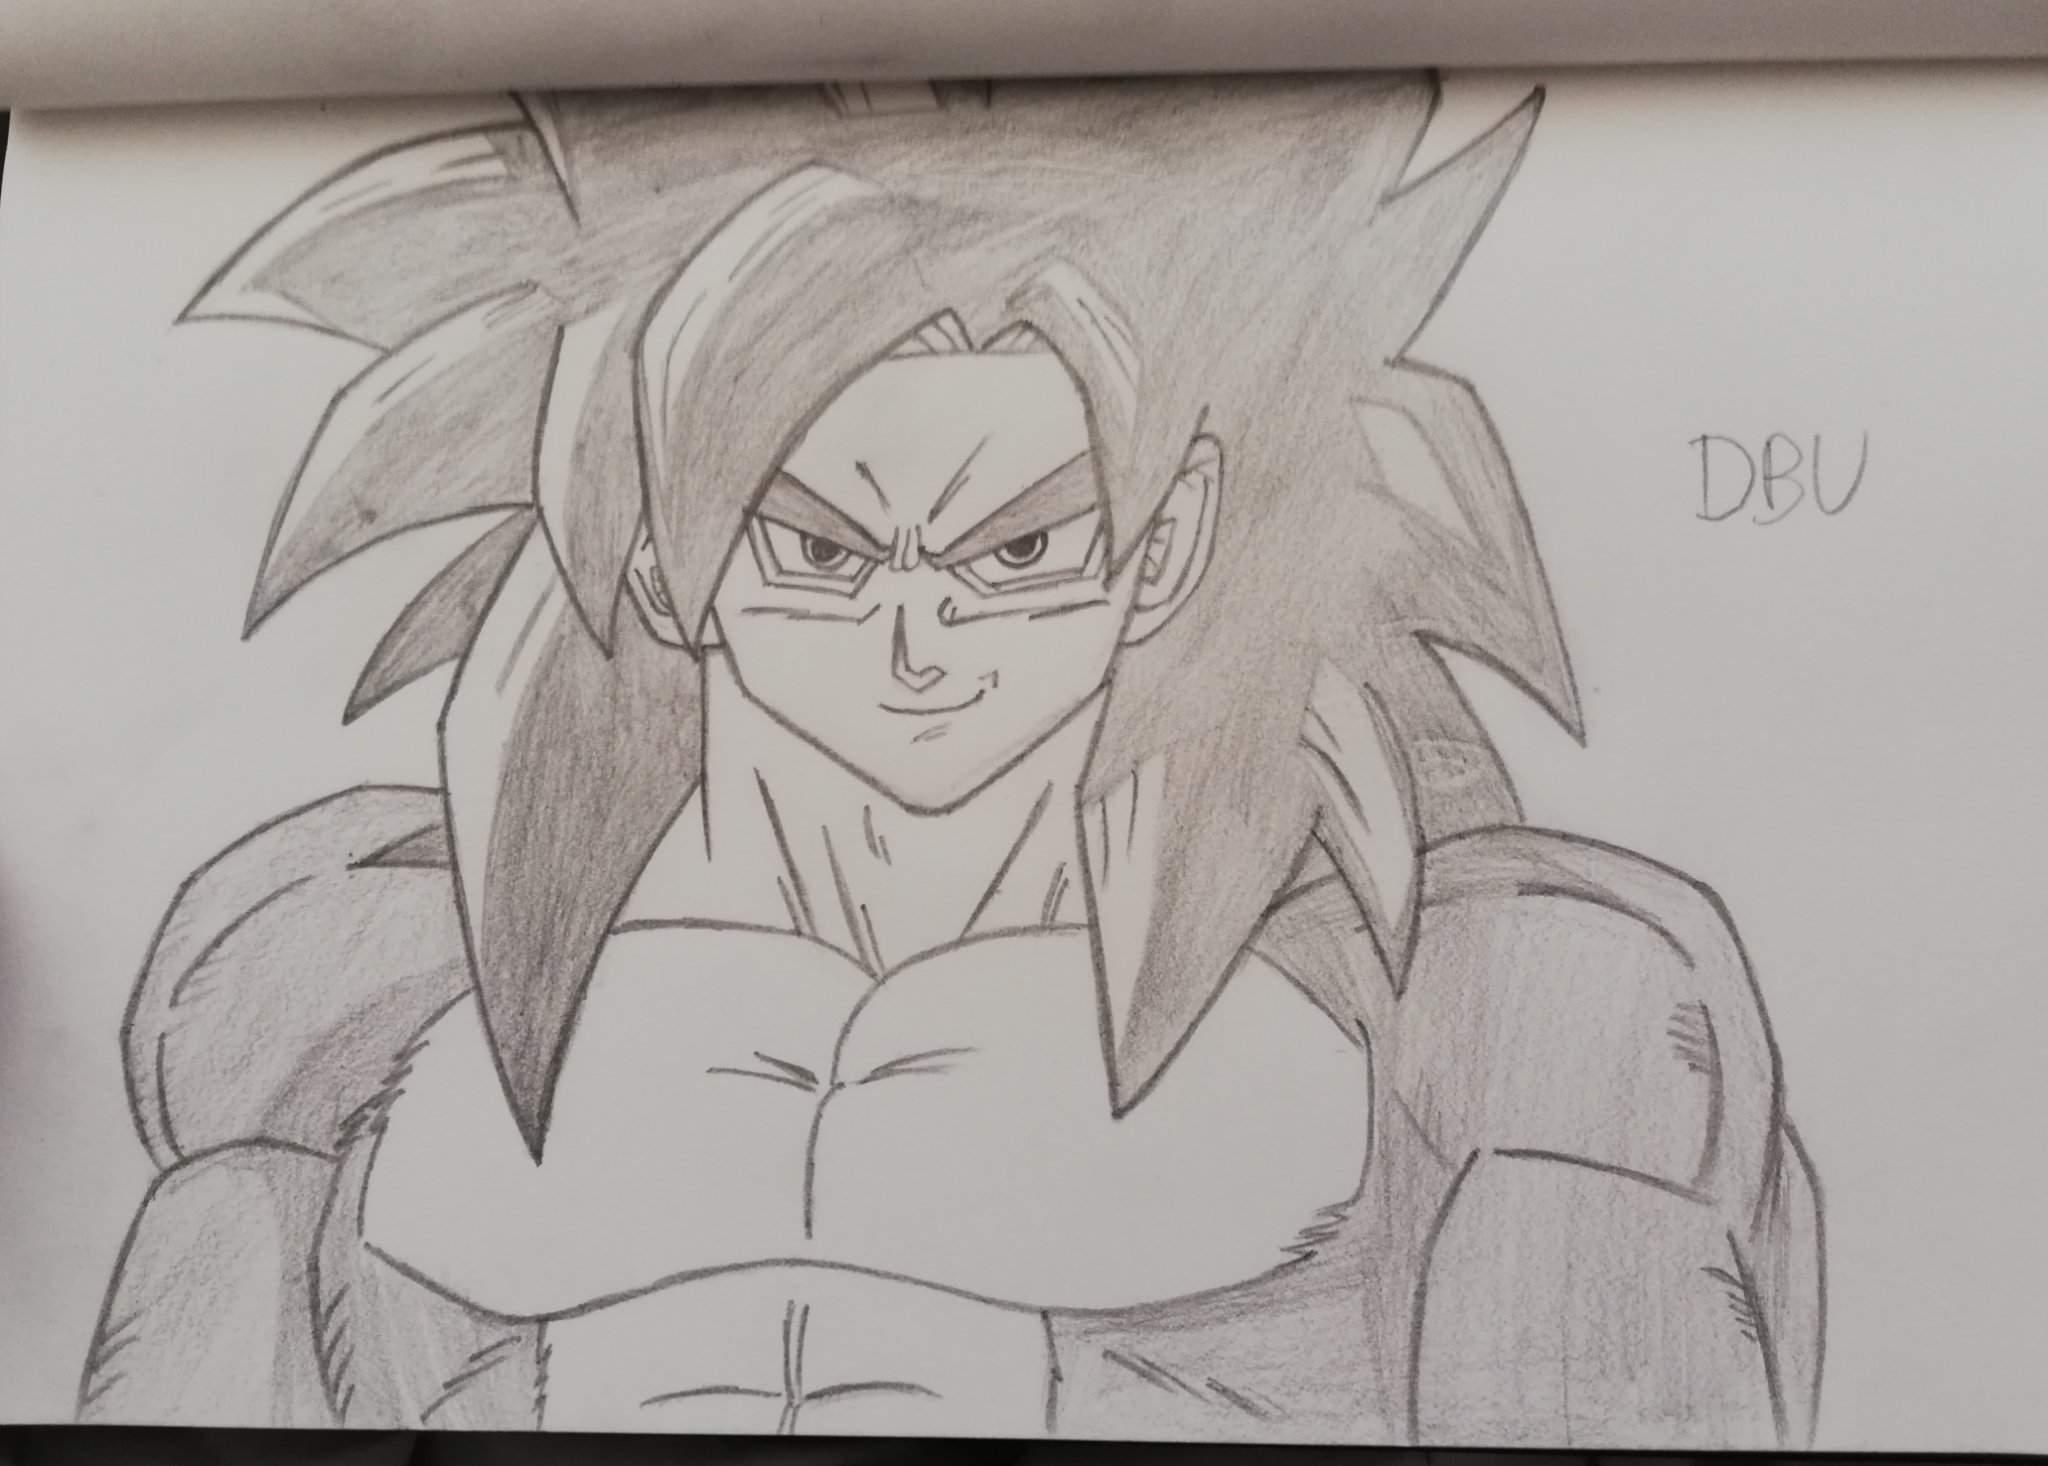 Petit Dessin De Goku Ssj4 Dragon Ball France Amino